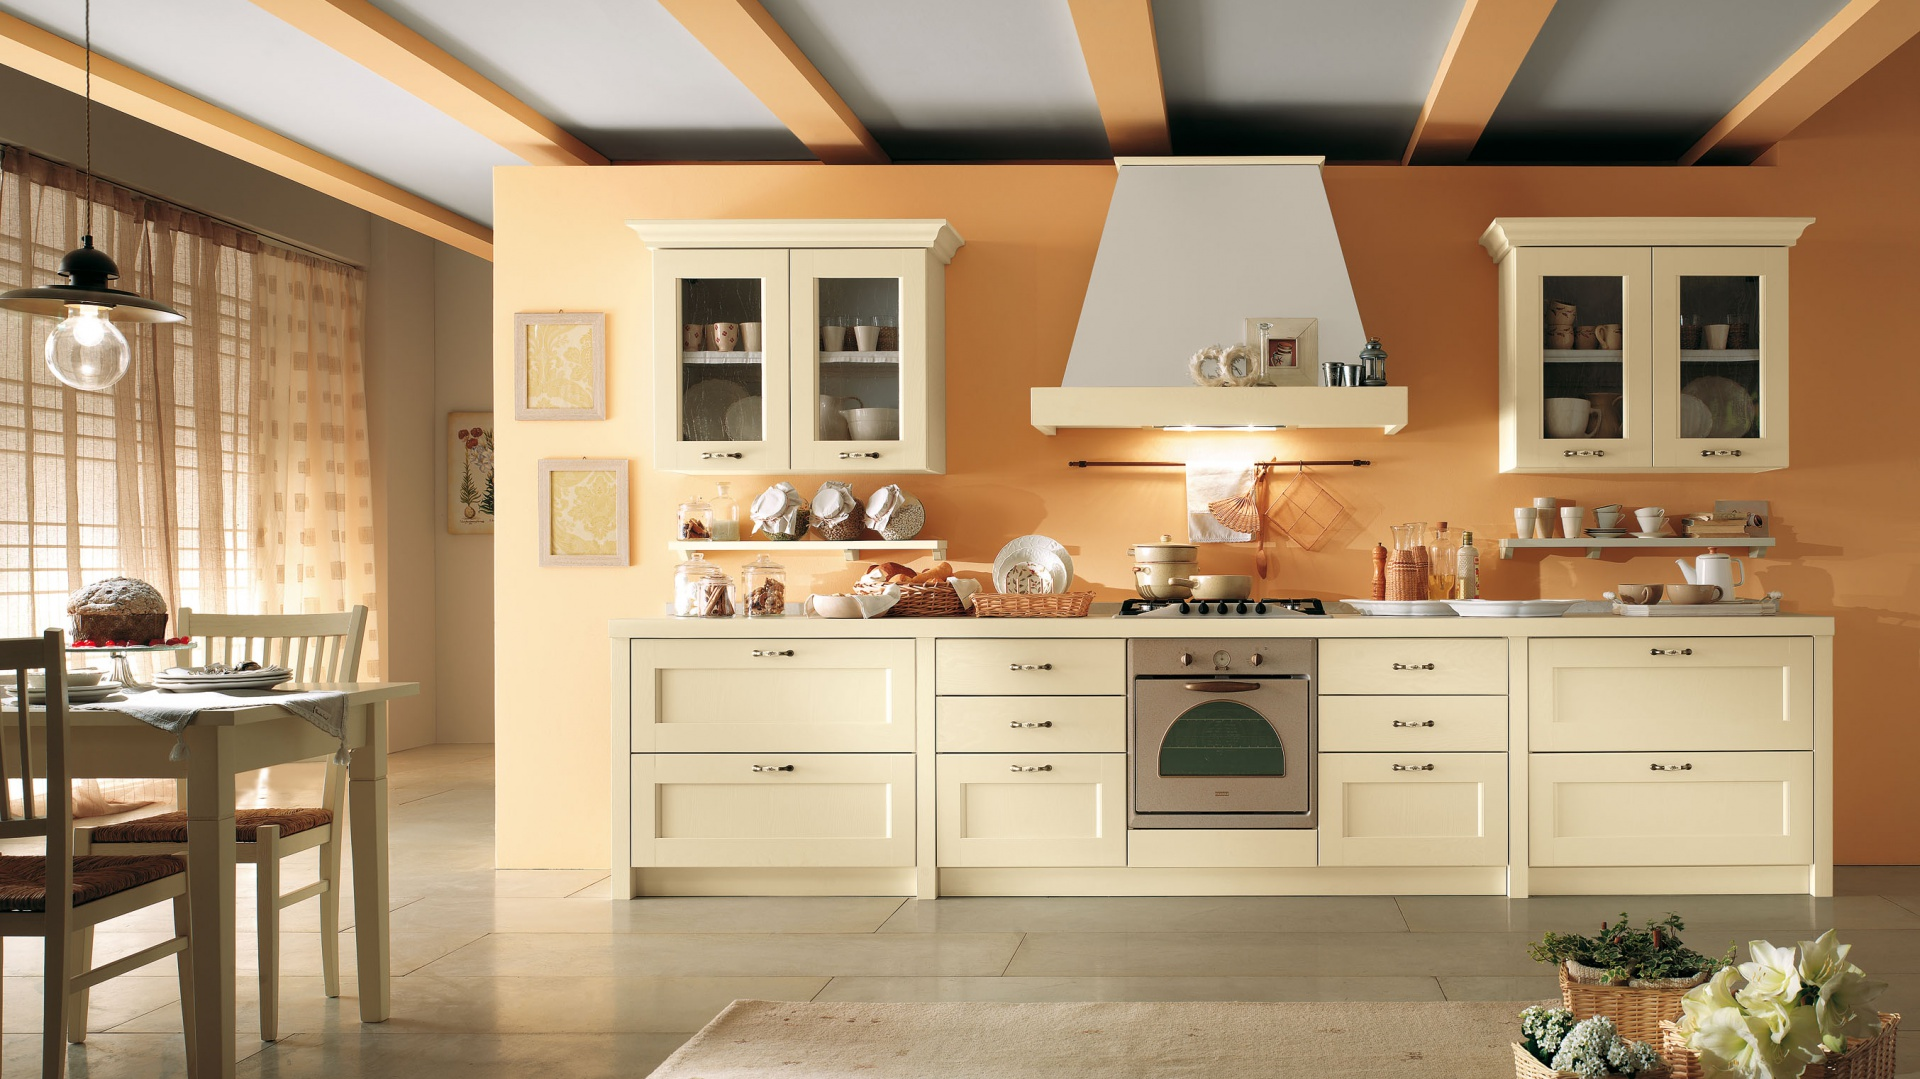 Drewniana Kuchnia Ciepła Piękna Naturalna